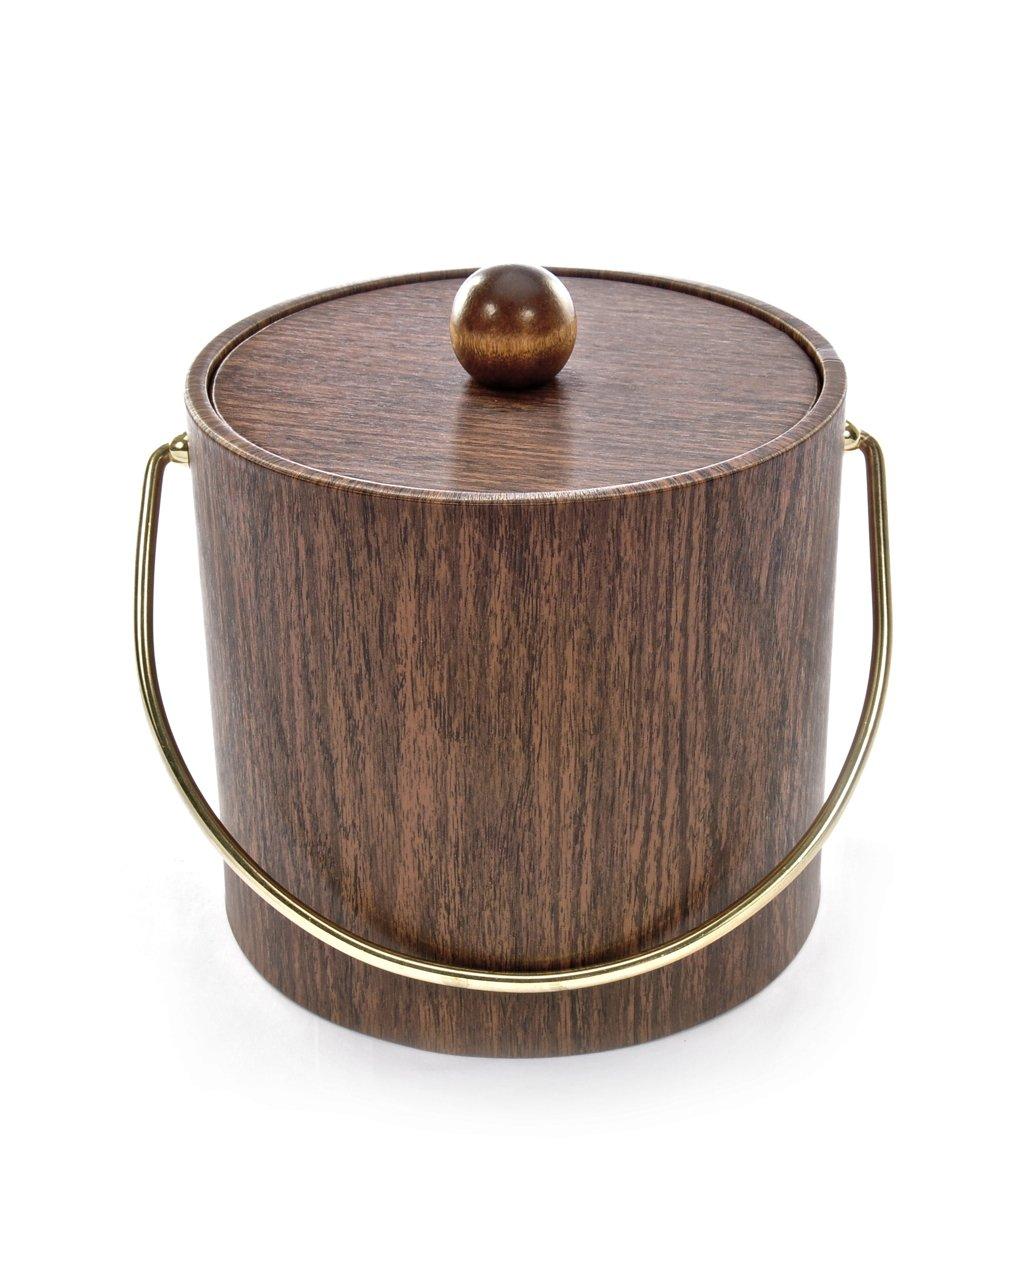 Mr. Ice Bucket 951-1 Walnut Woodgrain Ice Bucket, 3-Quart